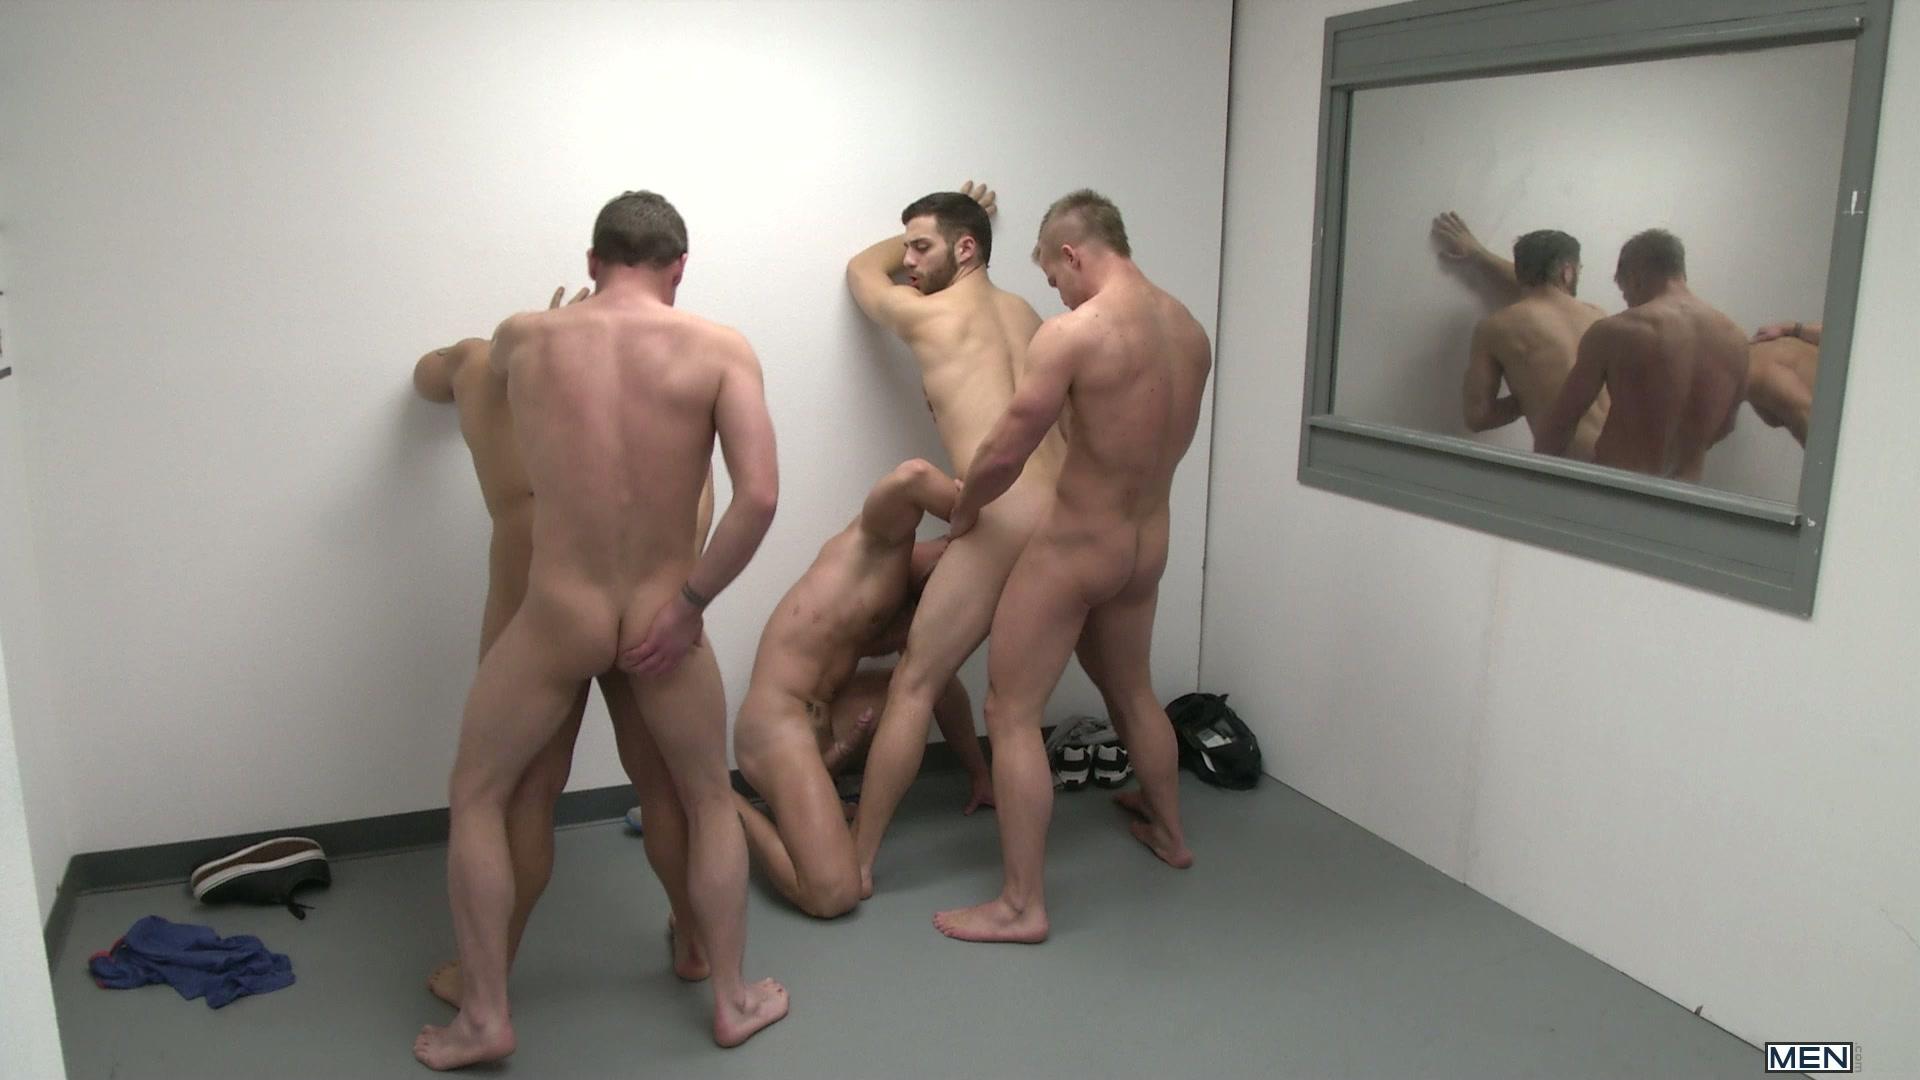 Watch The Line Up – Jo – Jizz Orgy – Trevor Knight – Tommy Defendi – Landon Conrad – Marcus Ruhl – Liam Magnuson (MEN.COM) Gay Porn Tube Videos Gifs And Free XXX HD Sex Movies Photos Online